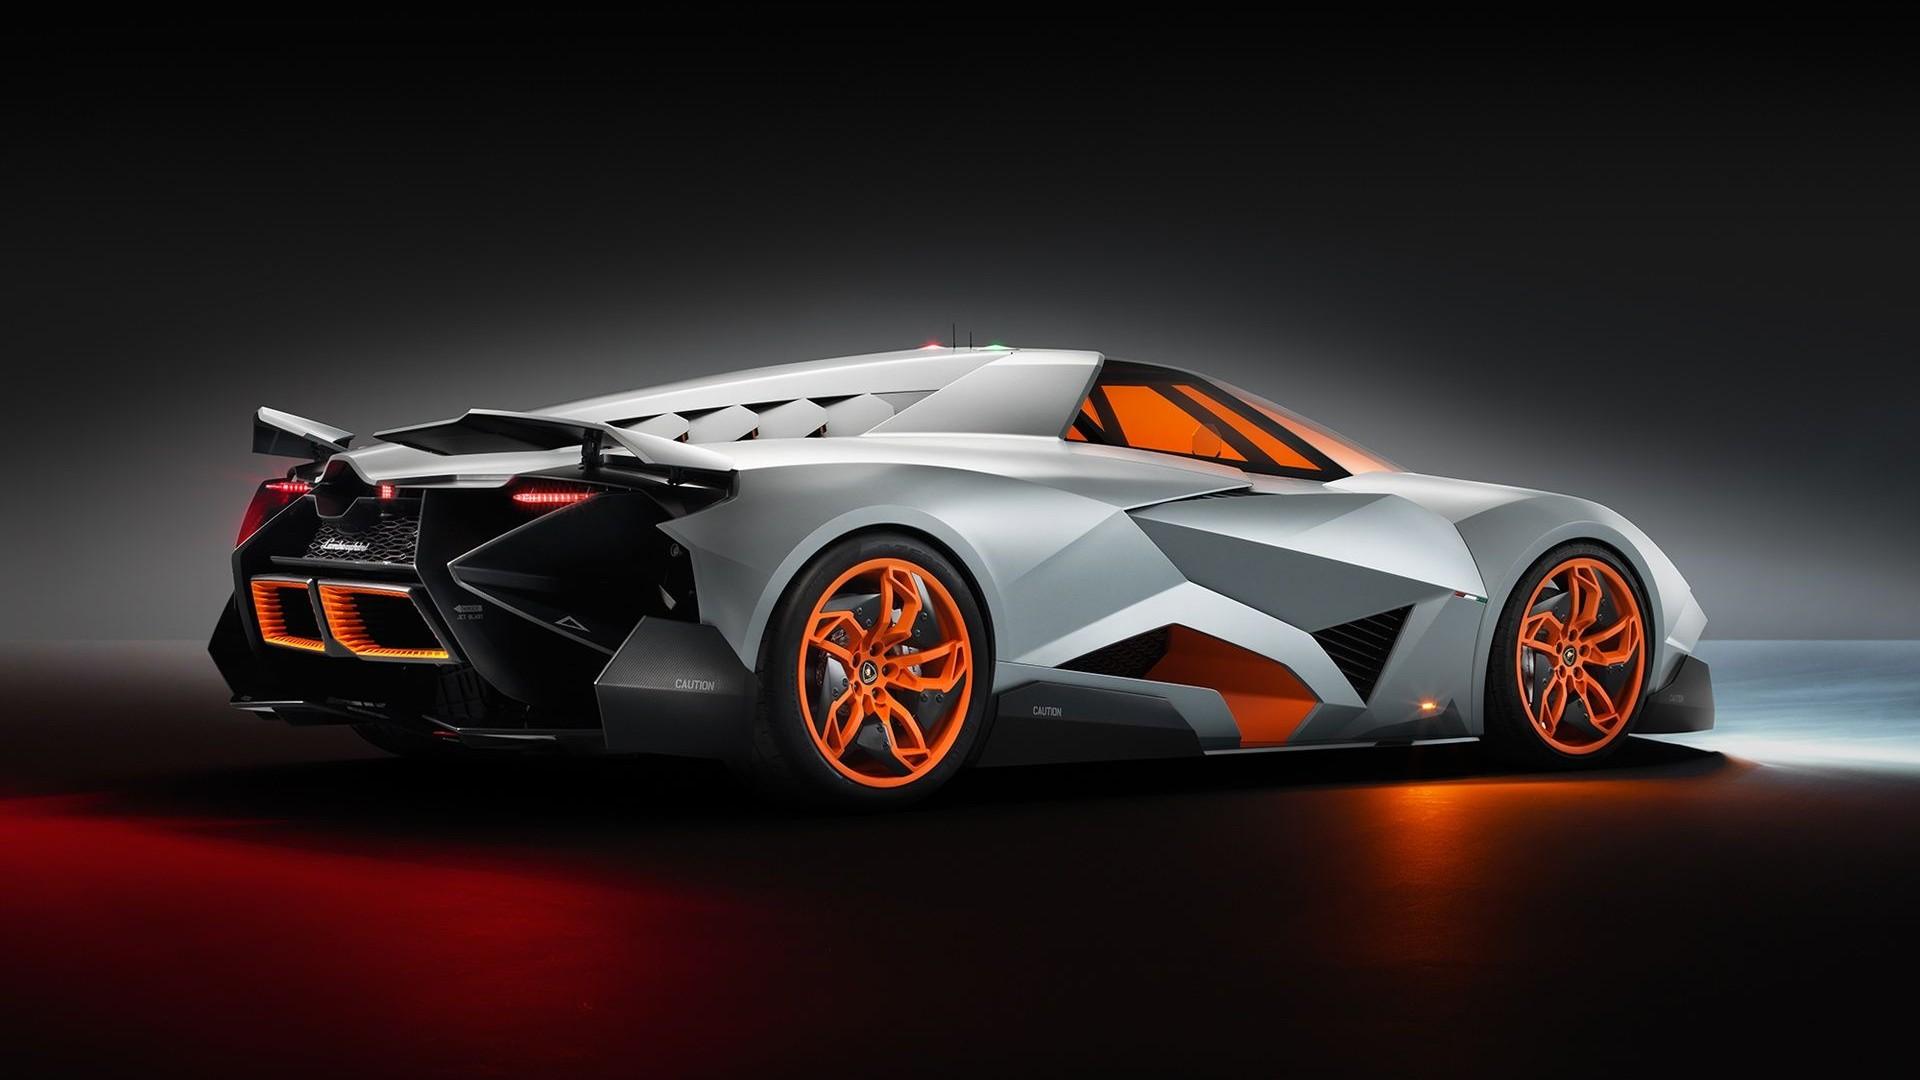 2013 Lamborghini Egoista supercar